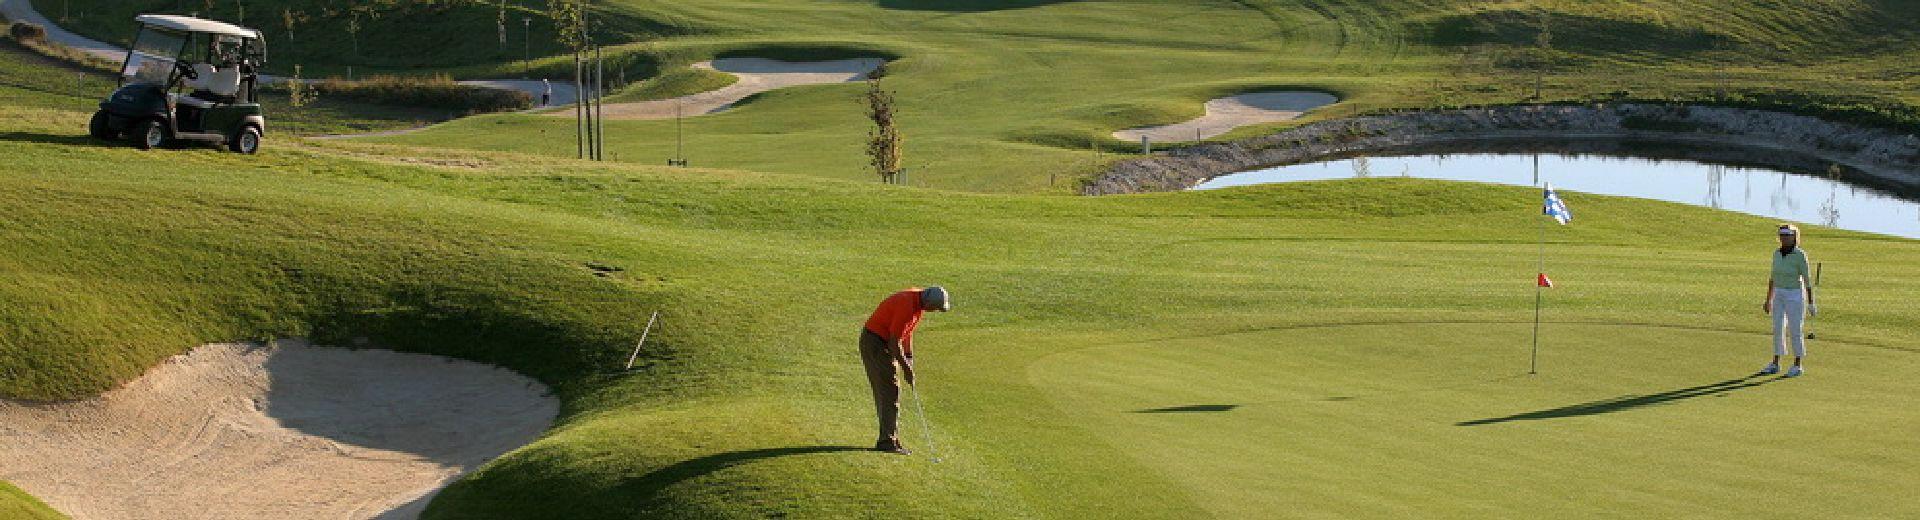 Deggendorfer Golfclub